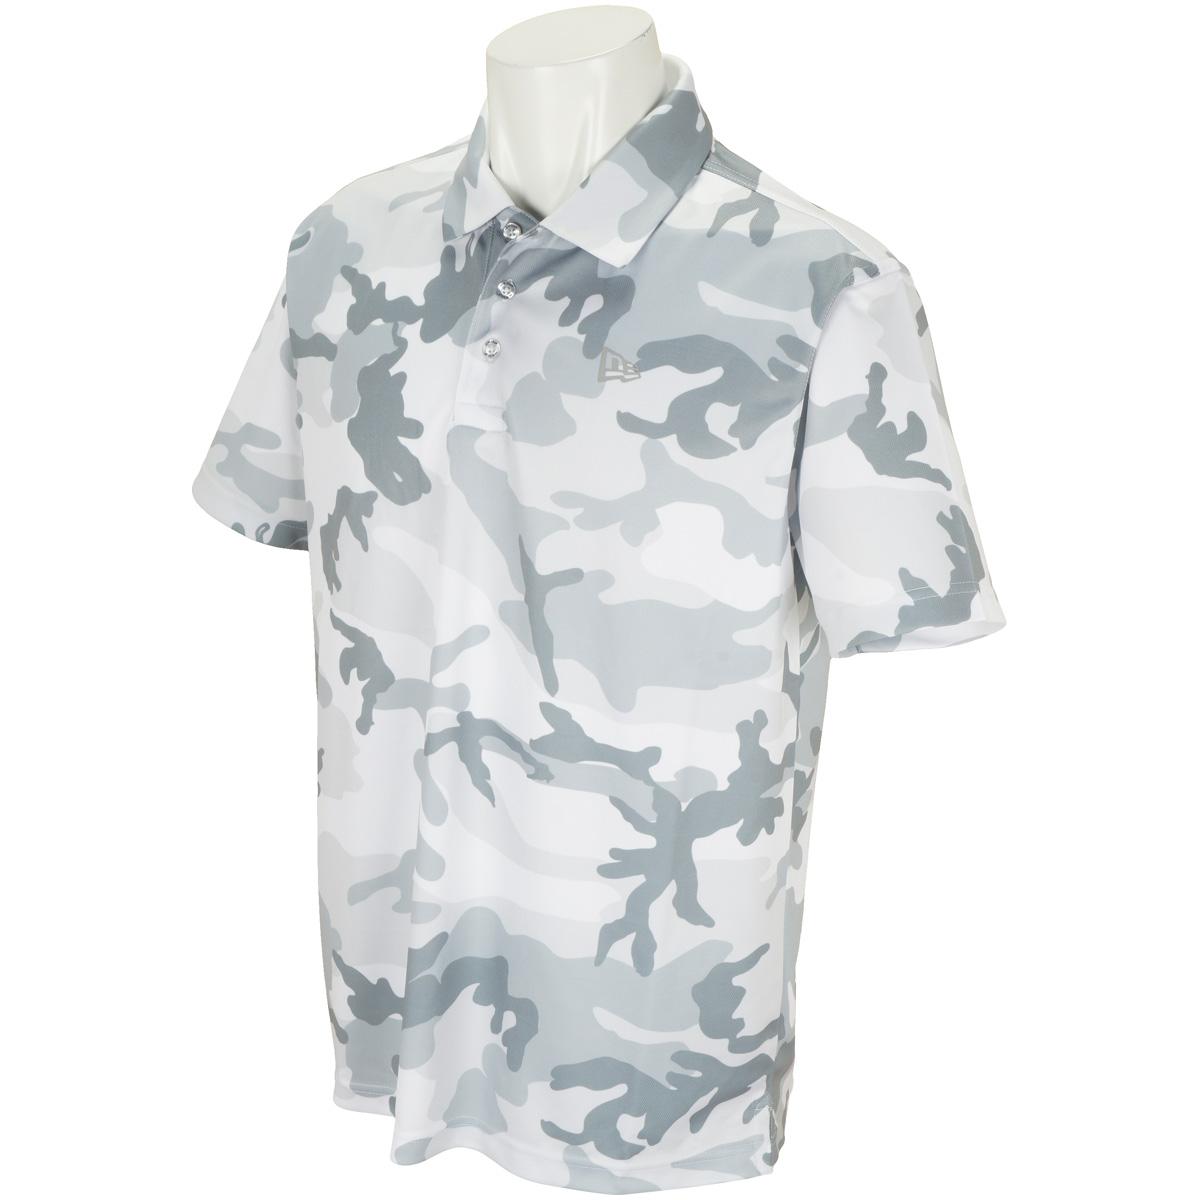 GOLF 鹿の子 COLOR 半袖ポロシャツ